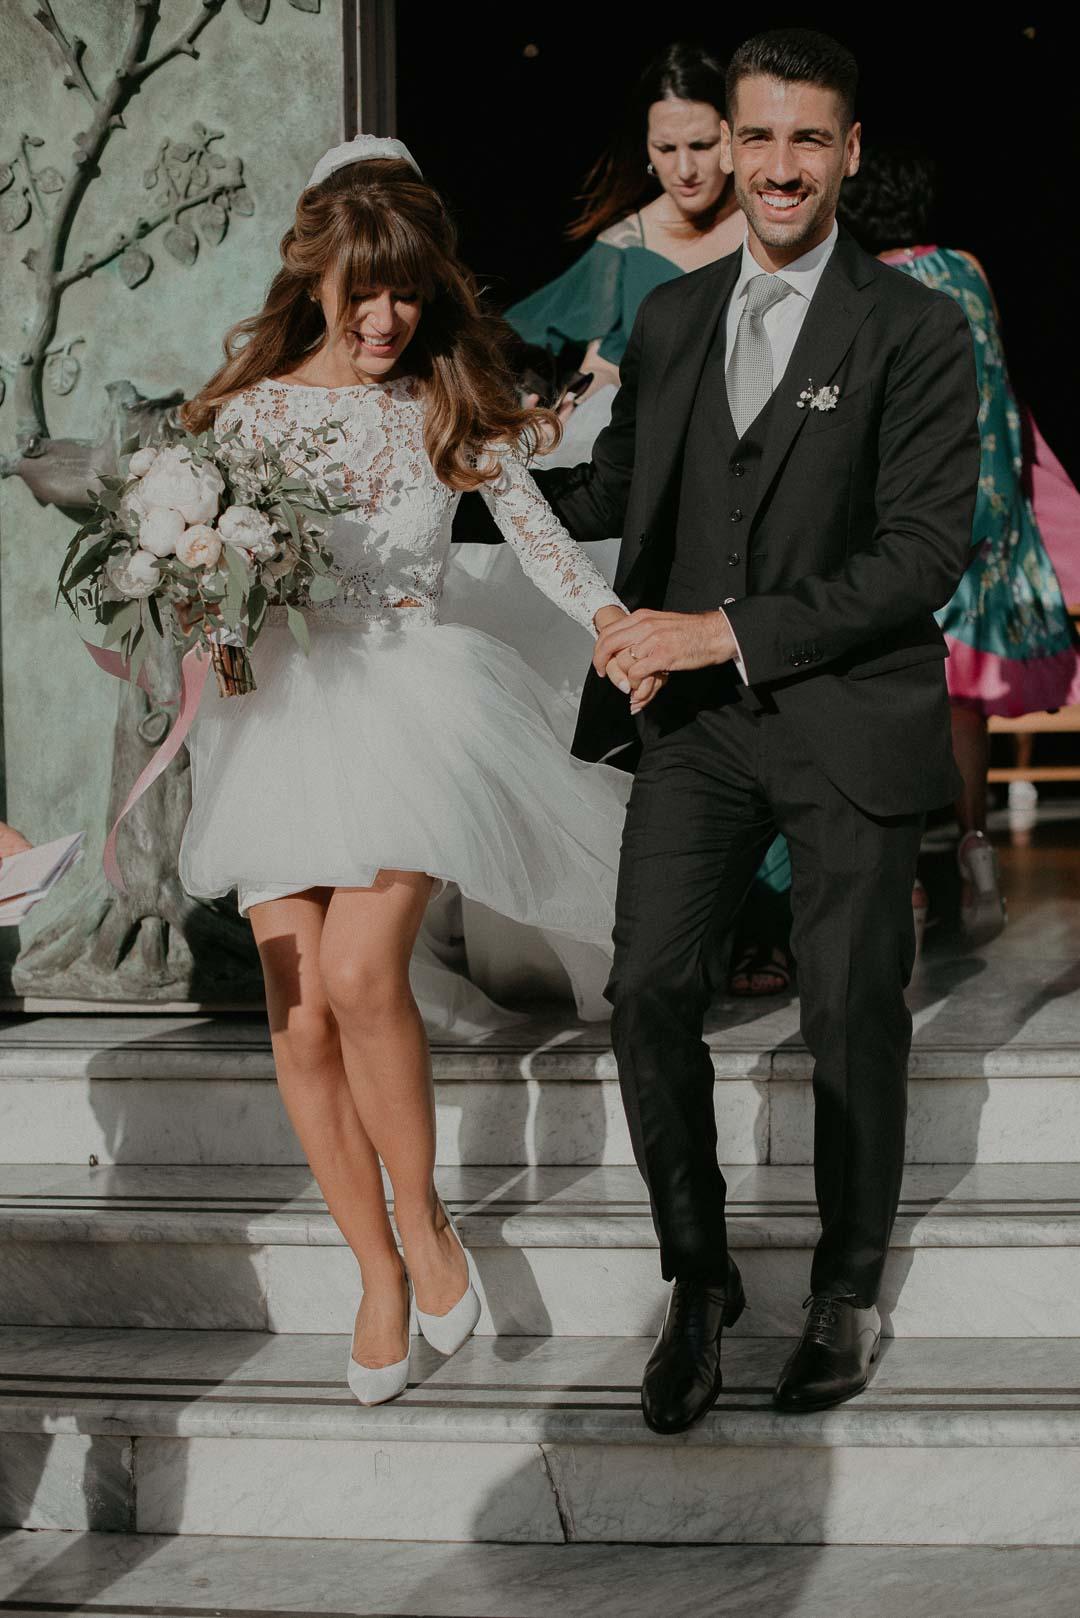 wedding-photographer-destination-fineart-bespoke-reportage-napoli-nabilah-vivianeizzo-spazio46-76